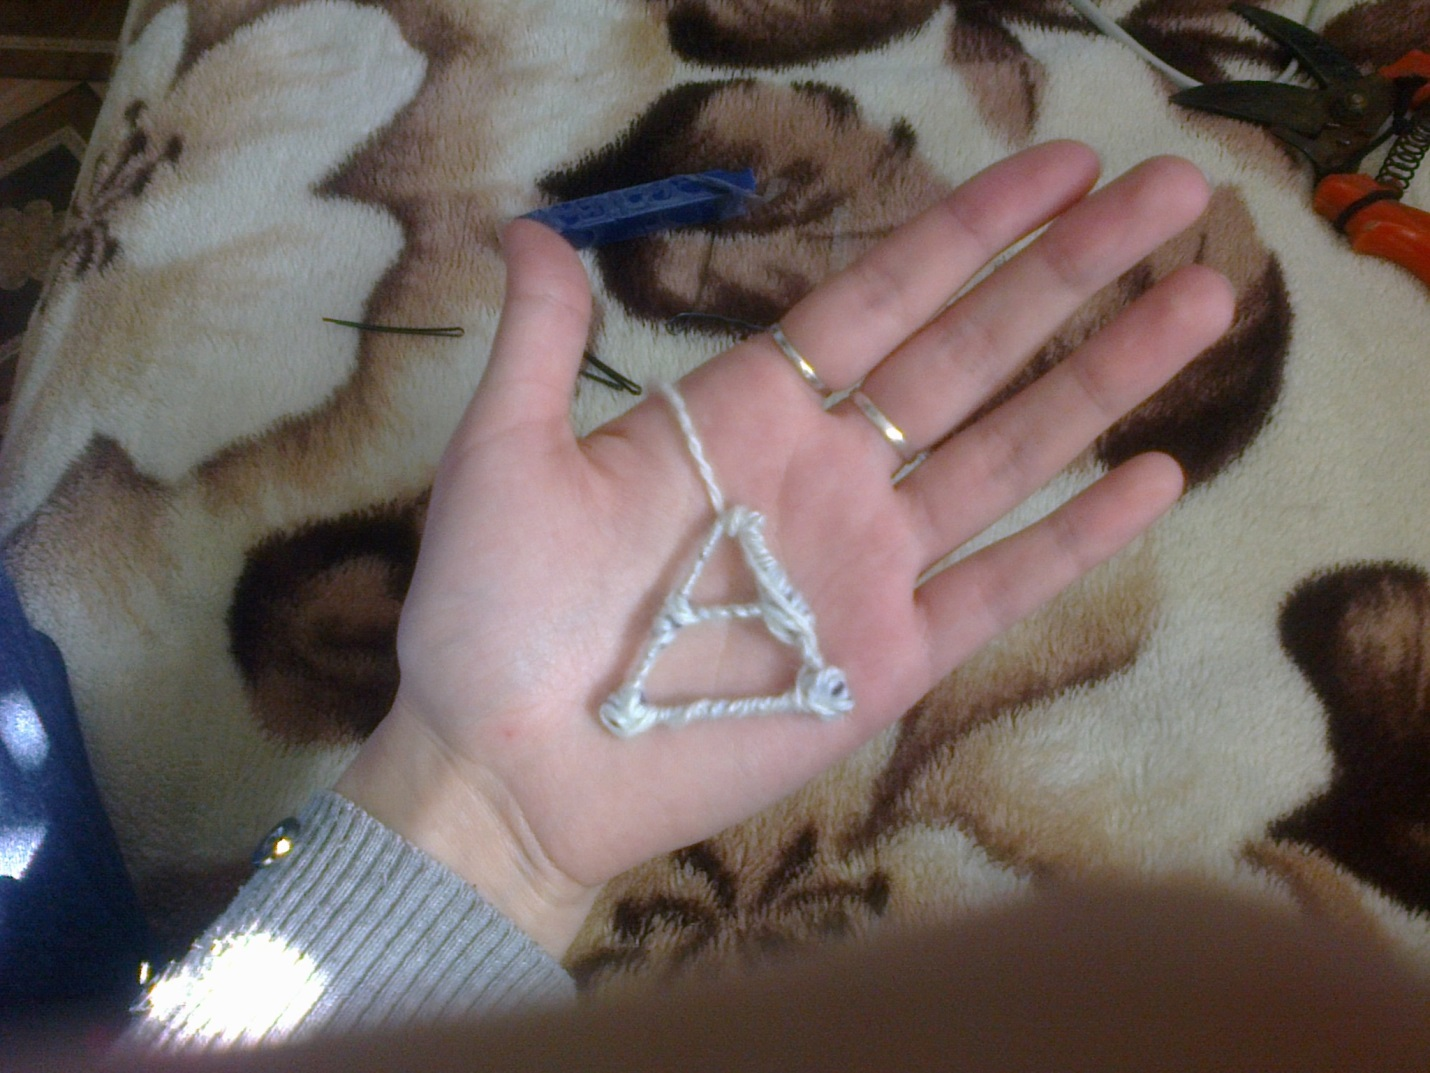 I:\Проект по кристаллам\проект\Фото1932.jpg